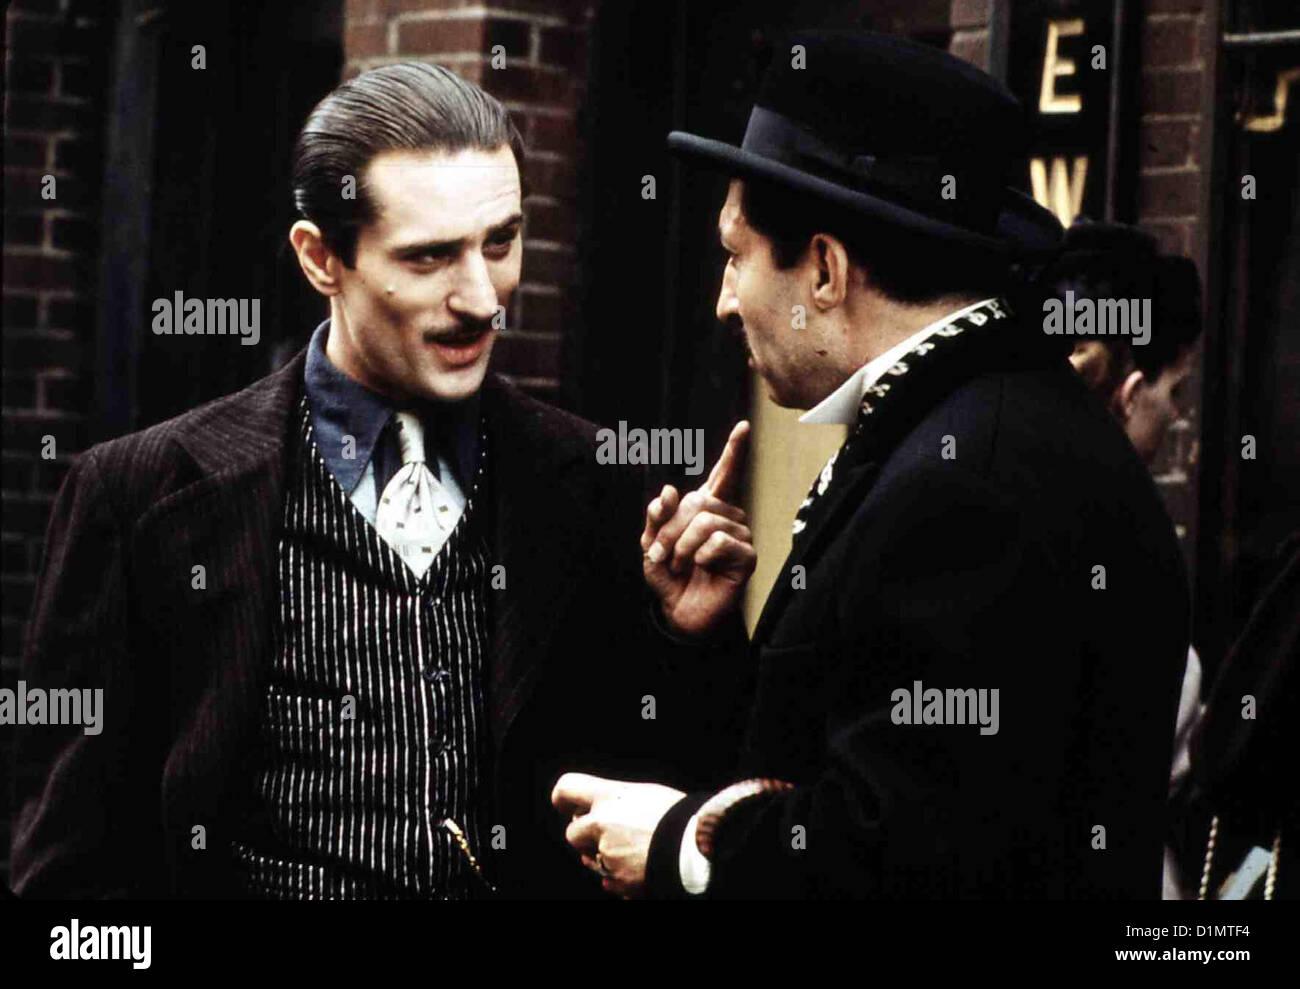 Der Pate Teil Ii Pate Ii Robert De Niro L Lokalen Caption